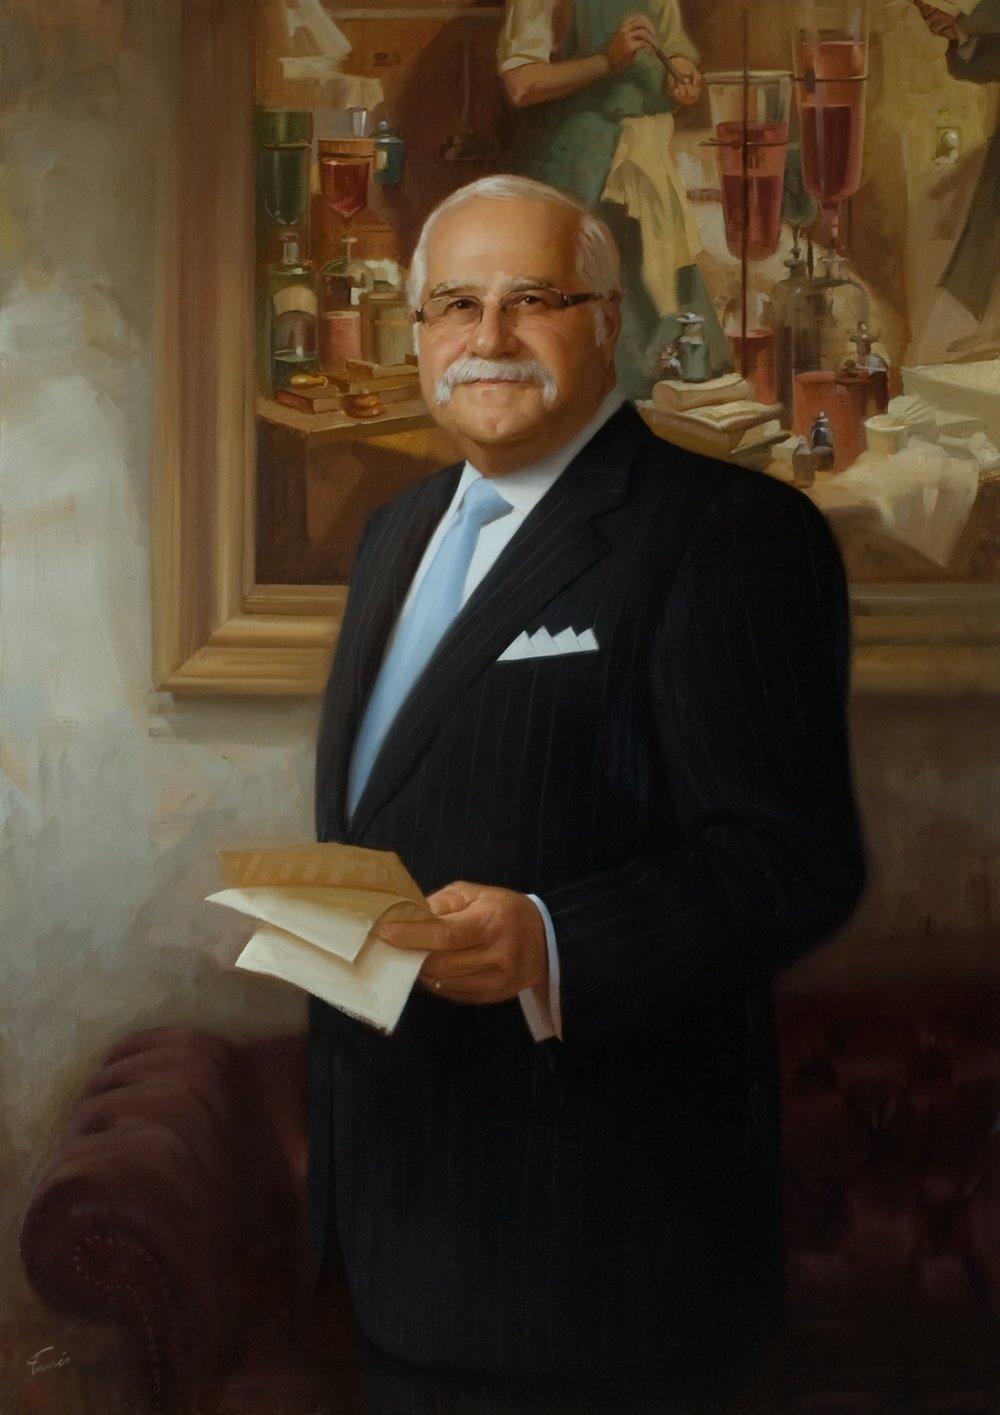 Dr. Philip Gerbino